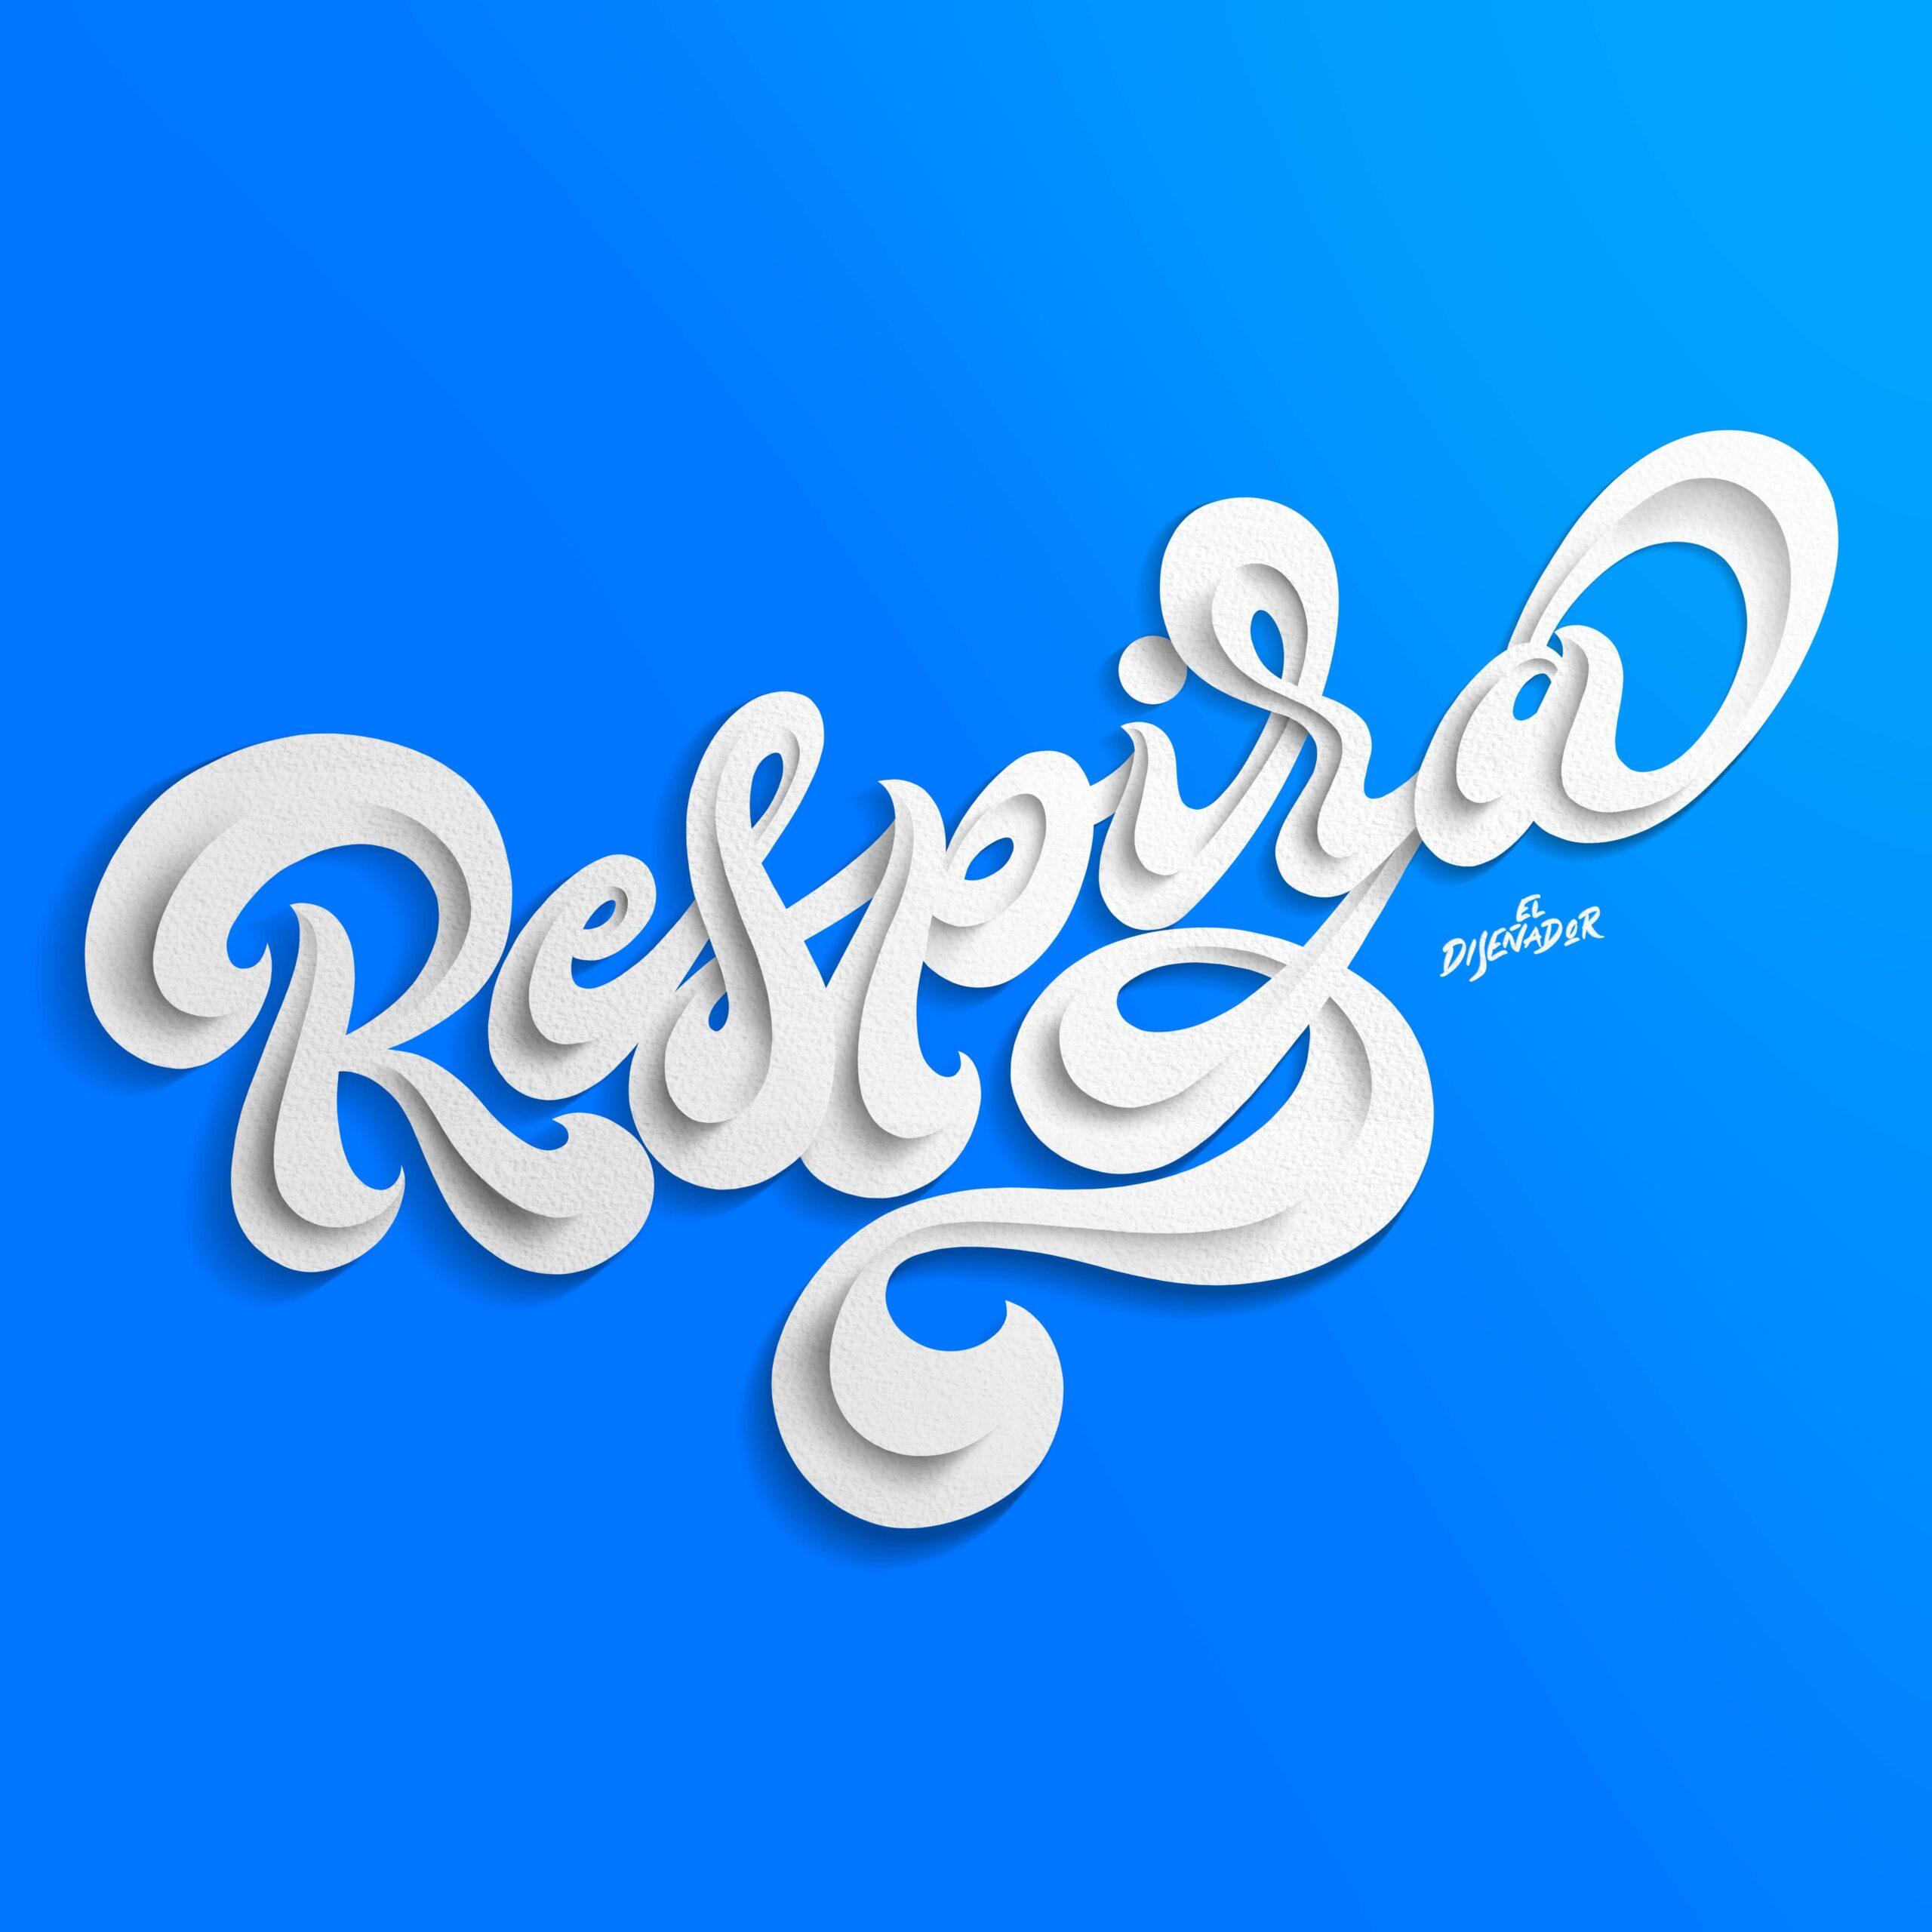 Respira - Bernardo Robles Romo